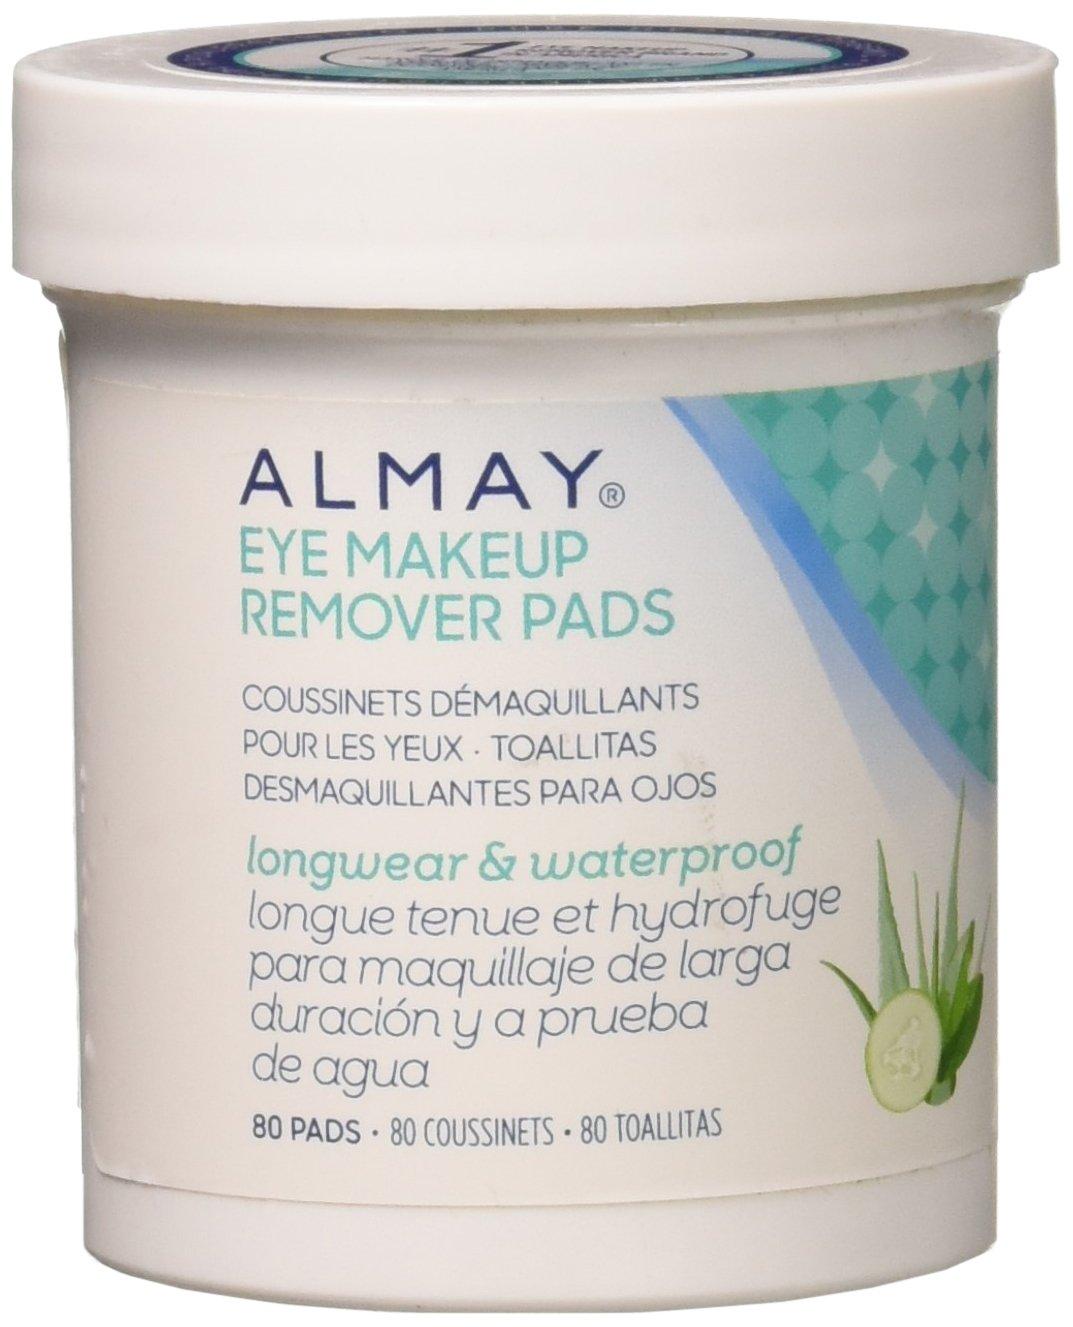 Amazon.com : Almay Oil Free Eye Makeup Remover Pads, 80